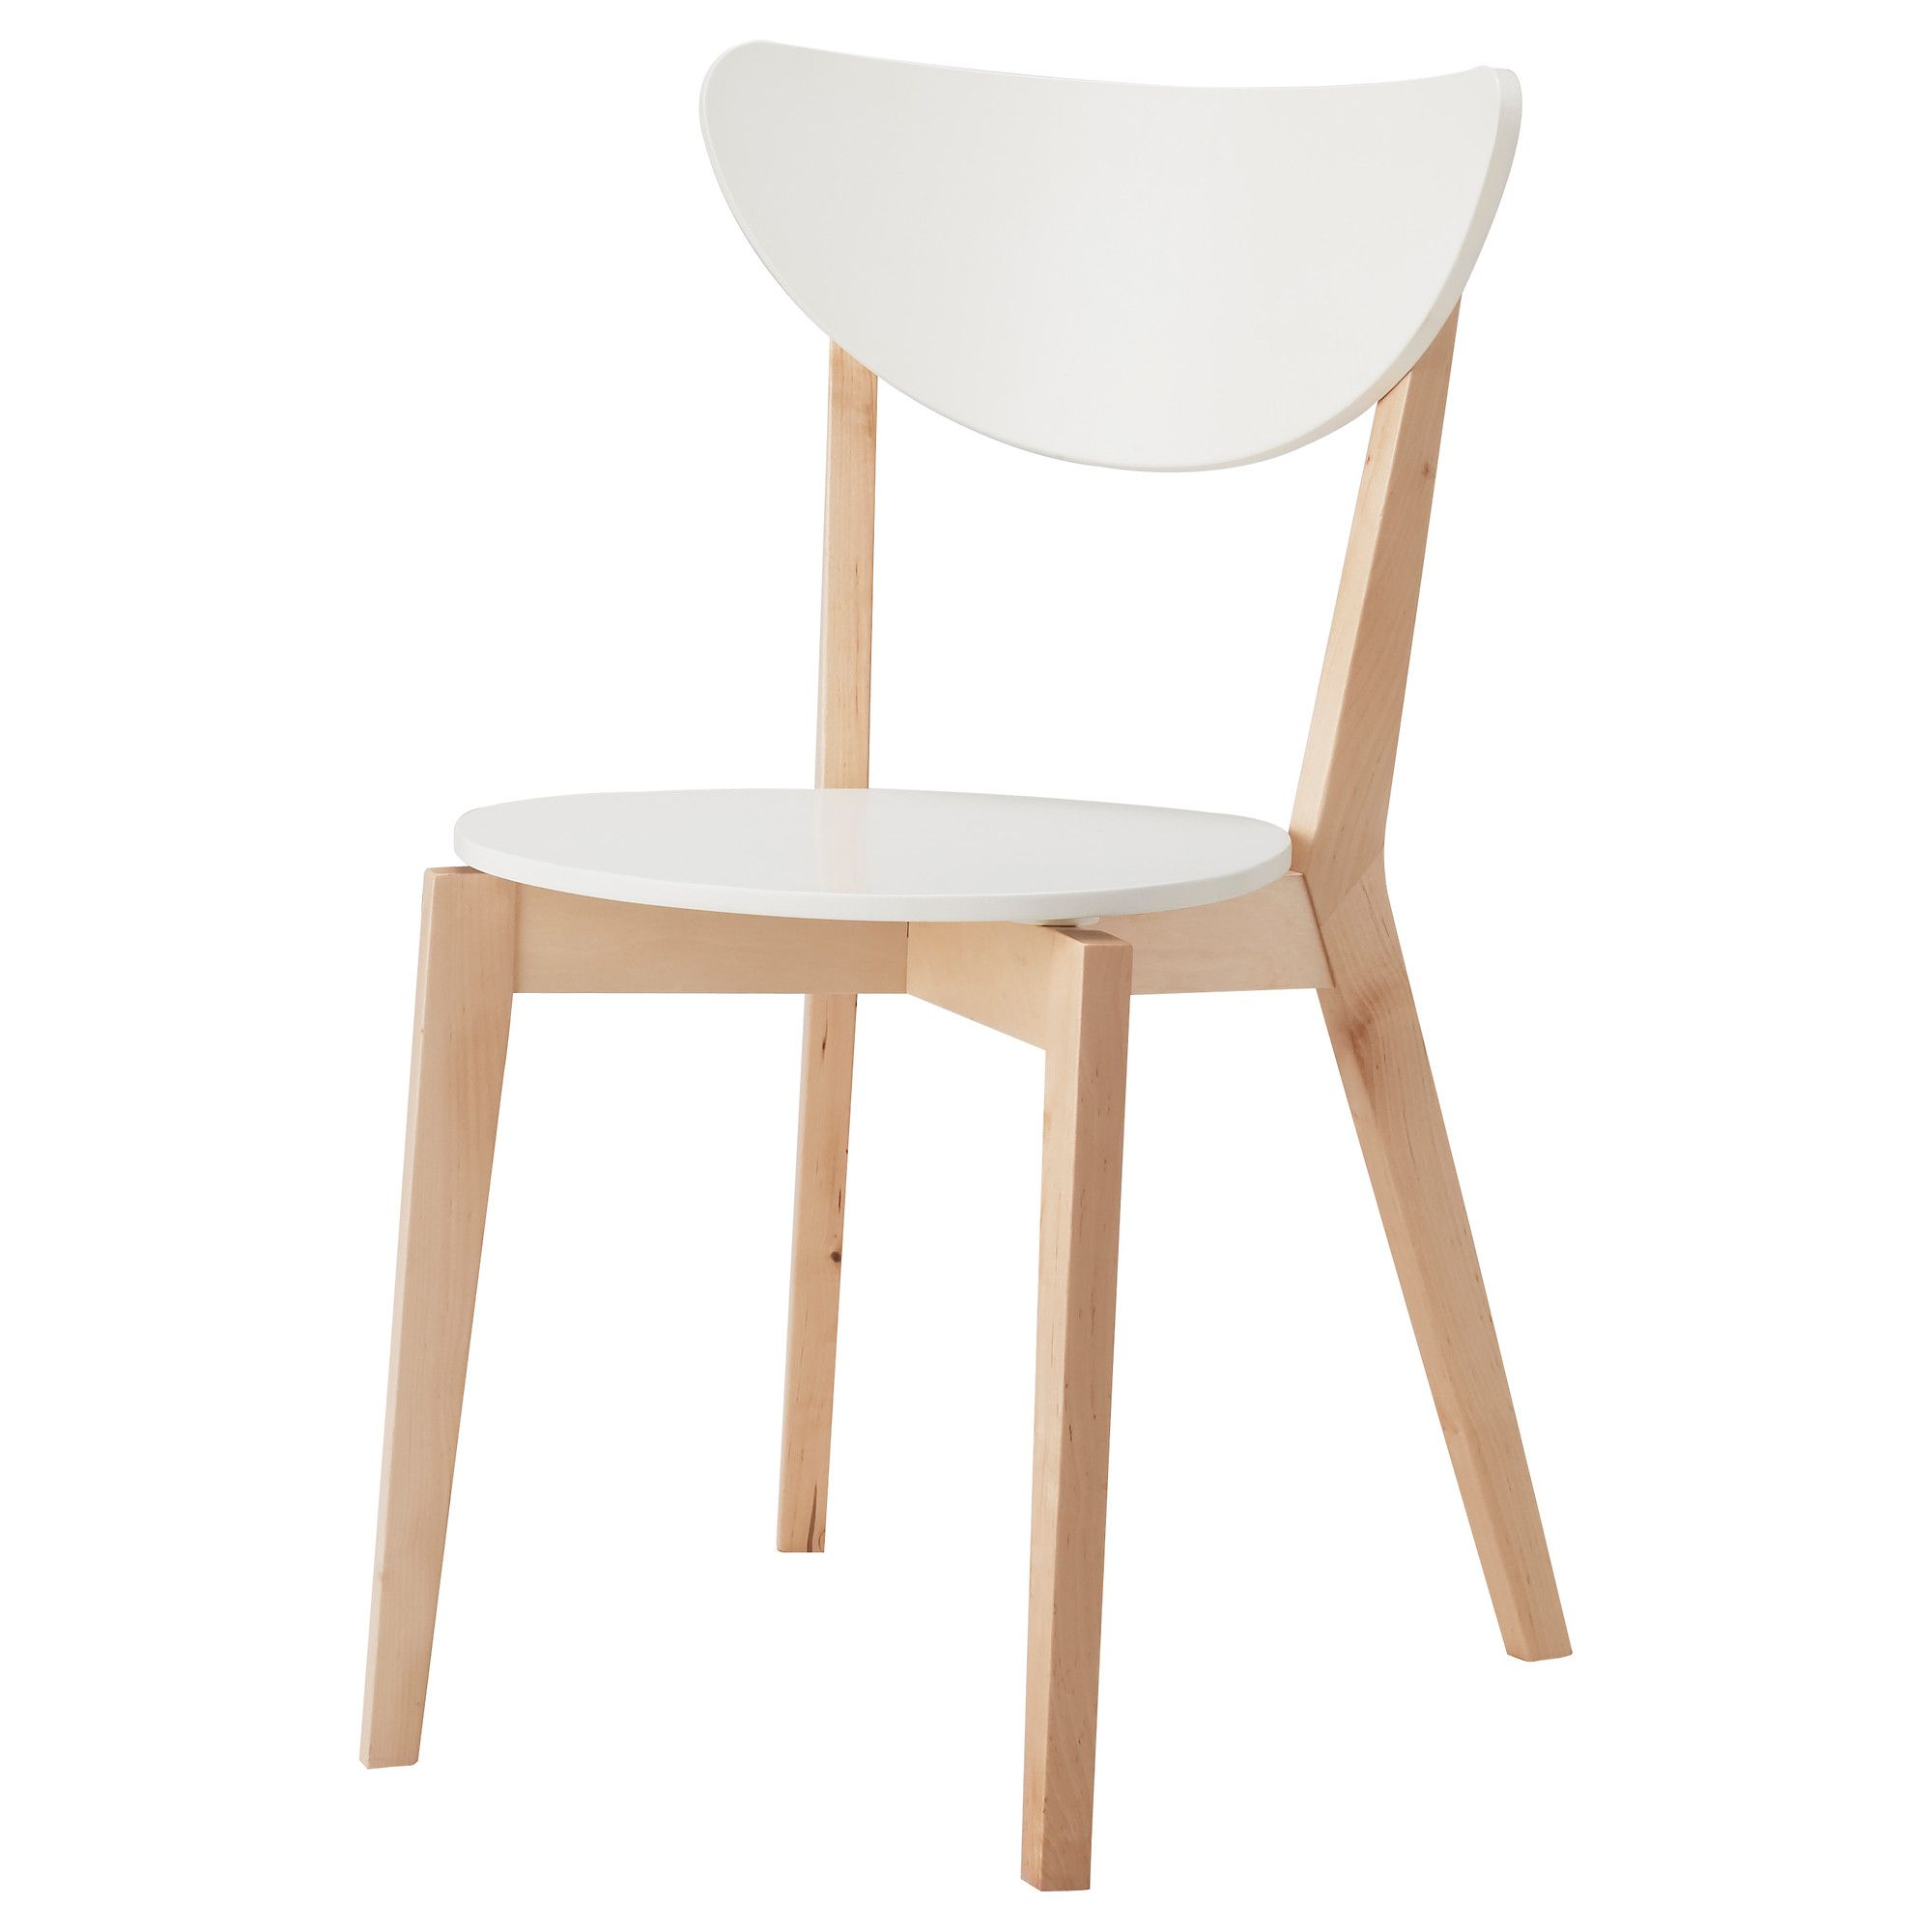 Us Furniture And Home Furnishings School Room Ikea